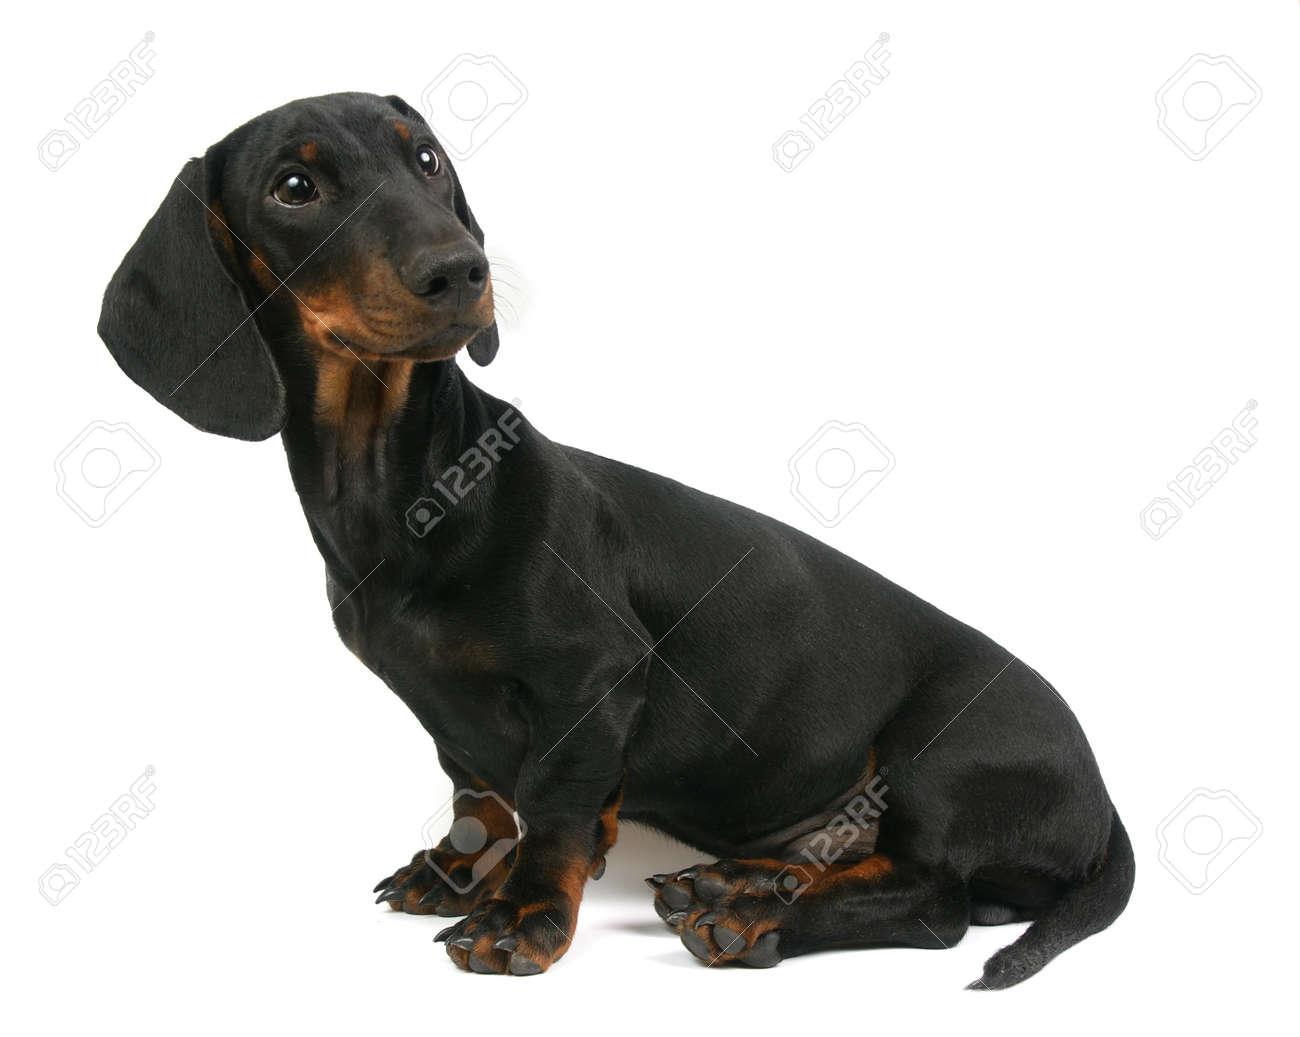 Dachshund puppy, 4 months old, portrait on a white background Stock Photo - 14411428